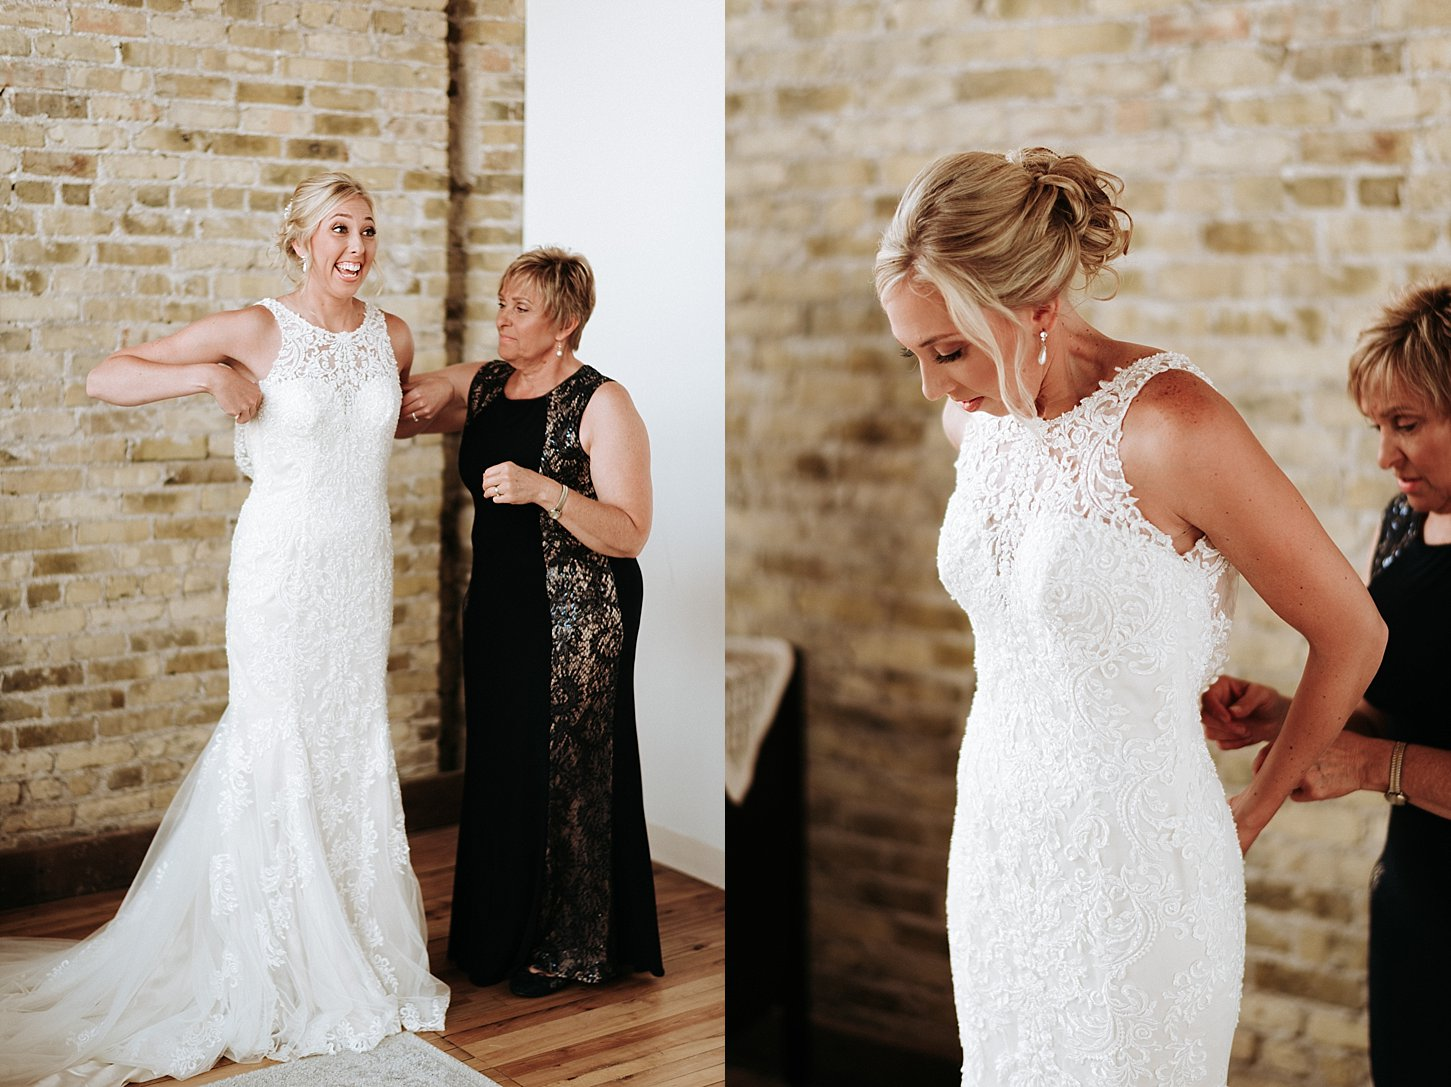 Jena cuellar wedding